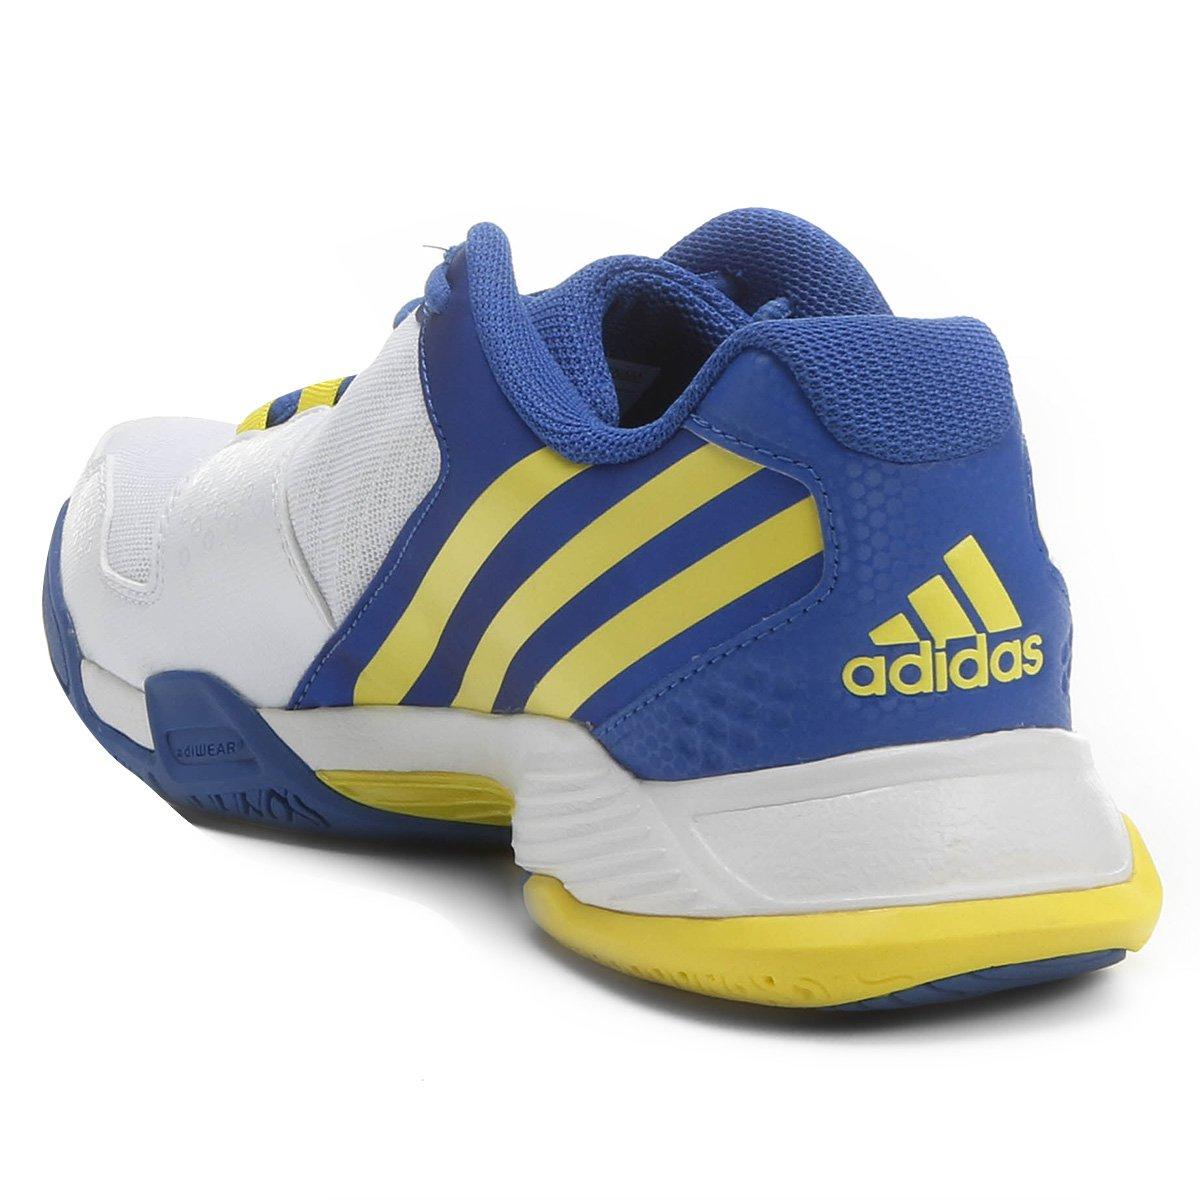 61dd923b867 ... Tênis Adidas Volley Team 4 - Branco+Azul. OFERTAS  OPEC